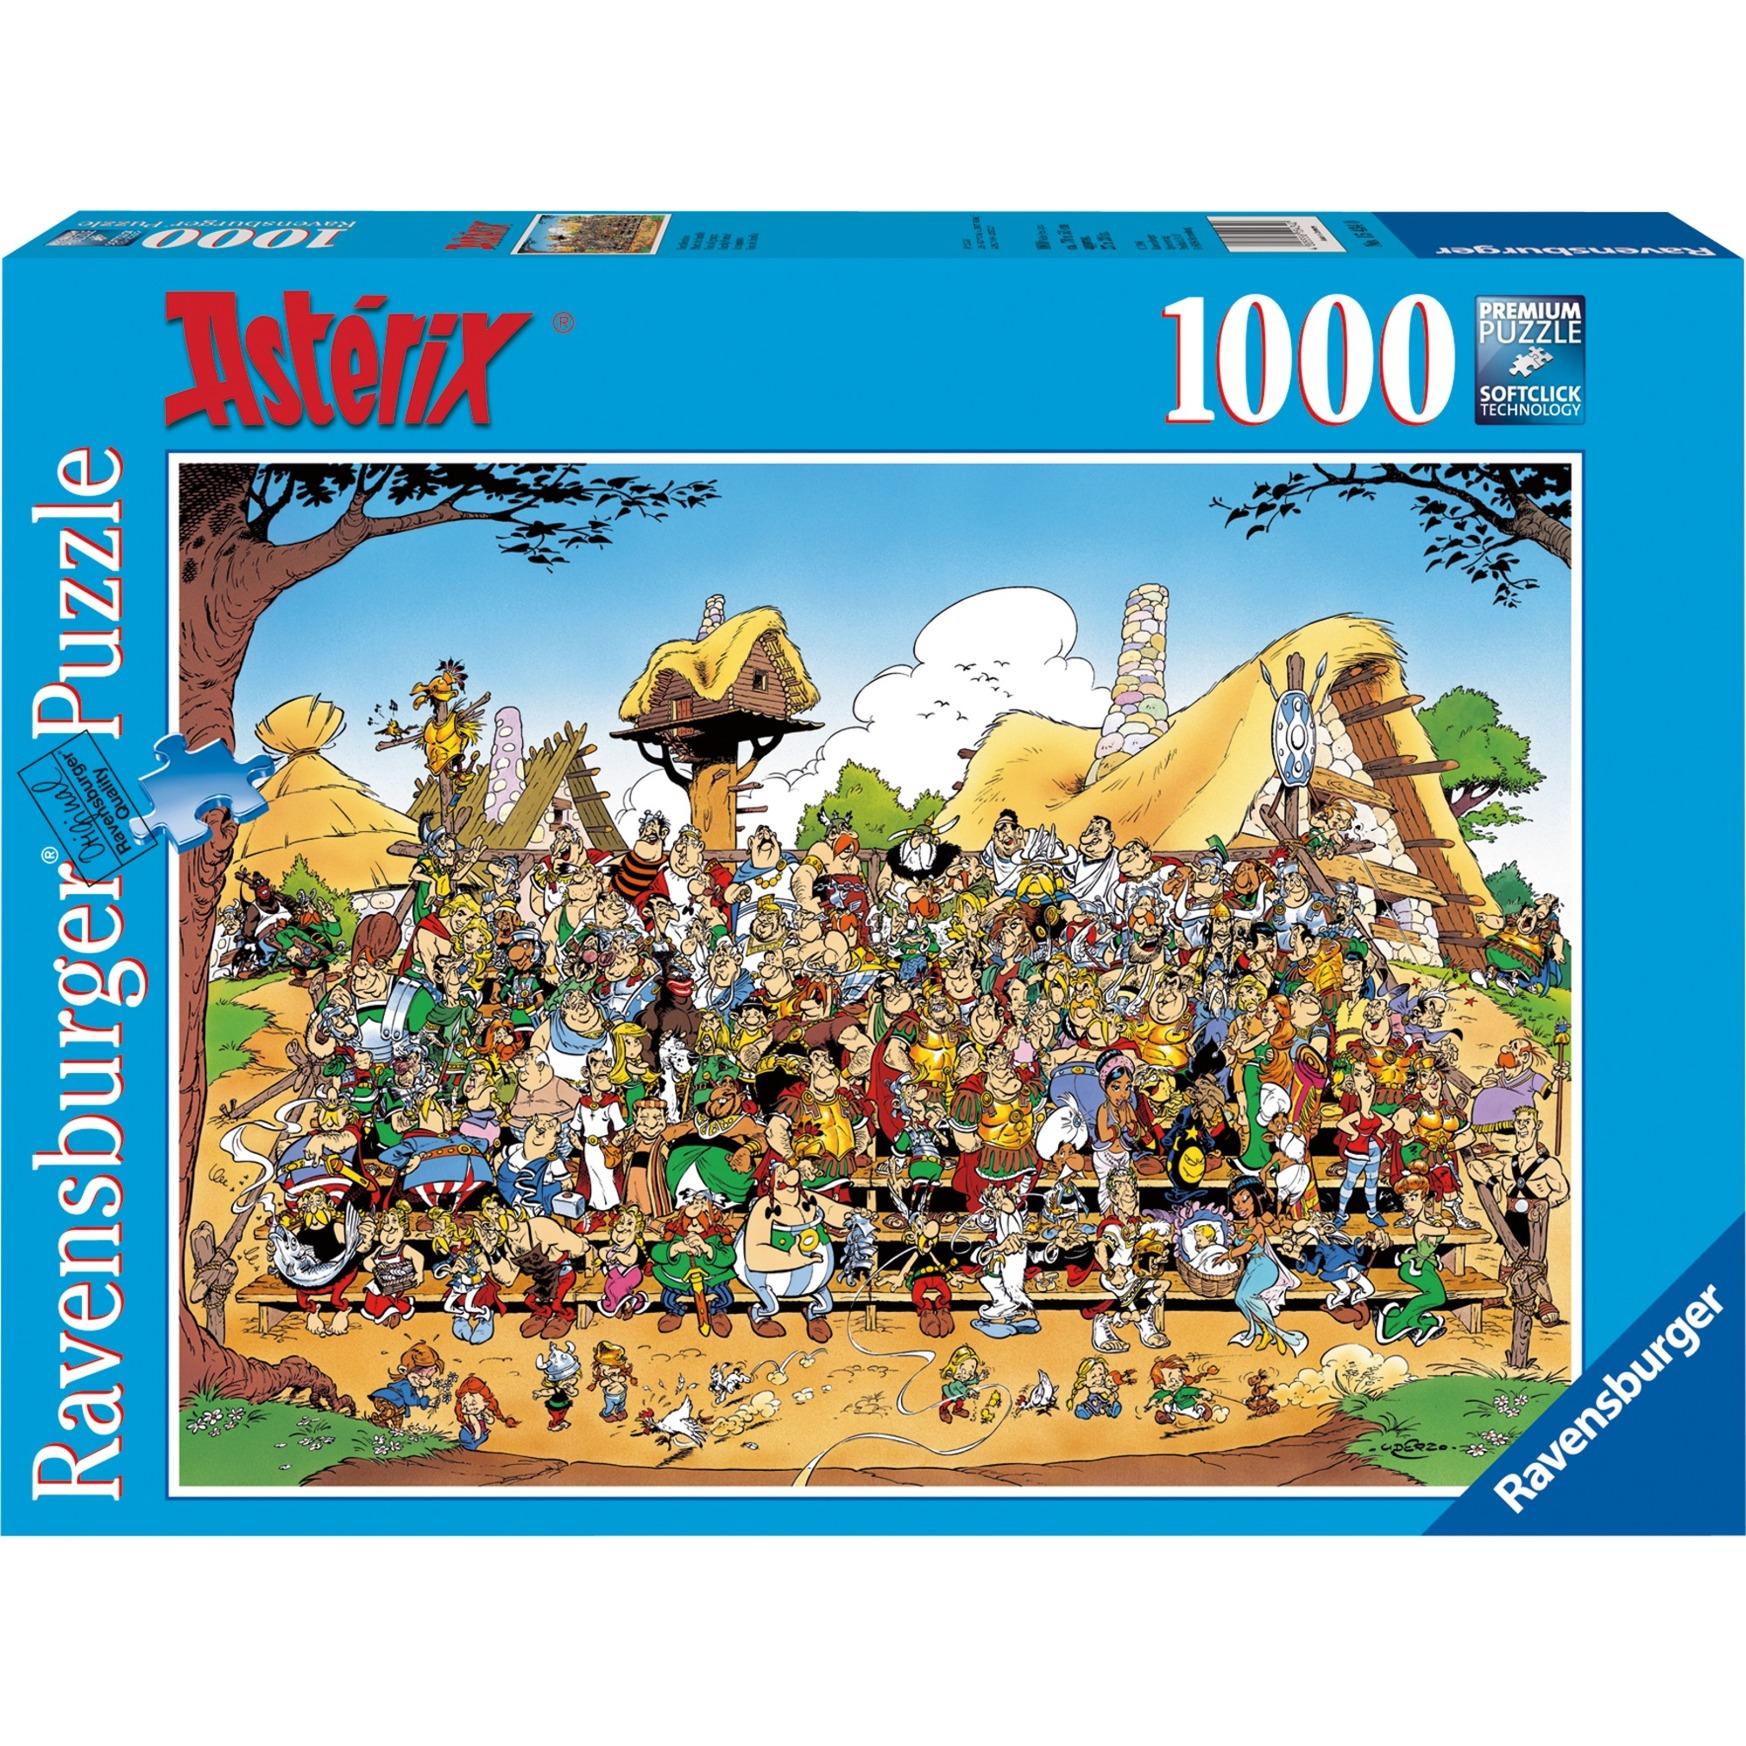 puzzle-asterix-familienfoto-puslespil